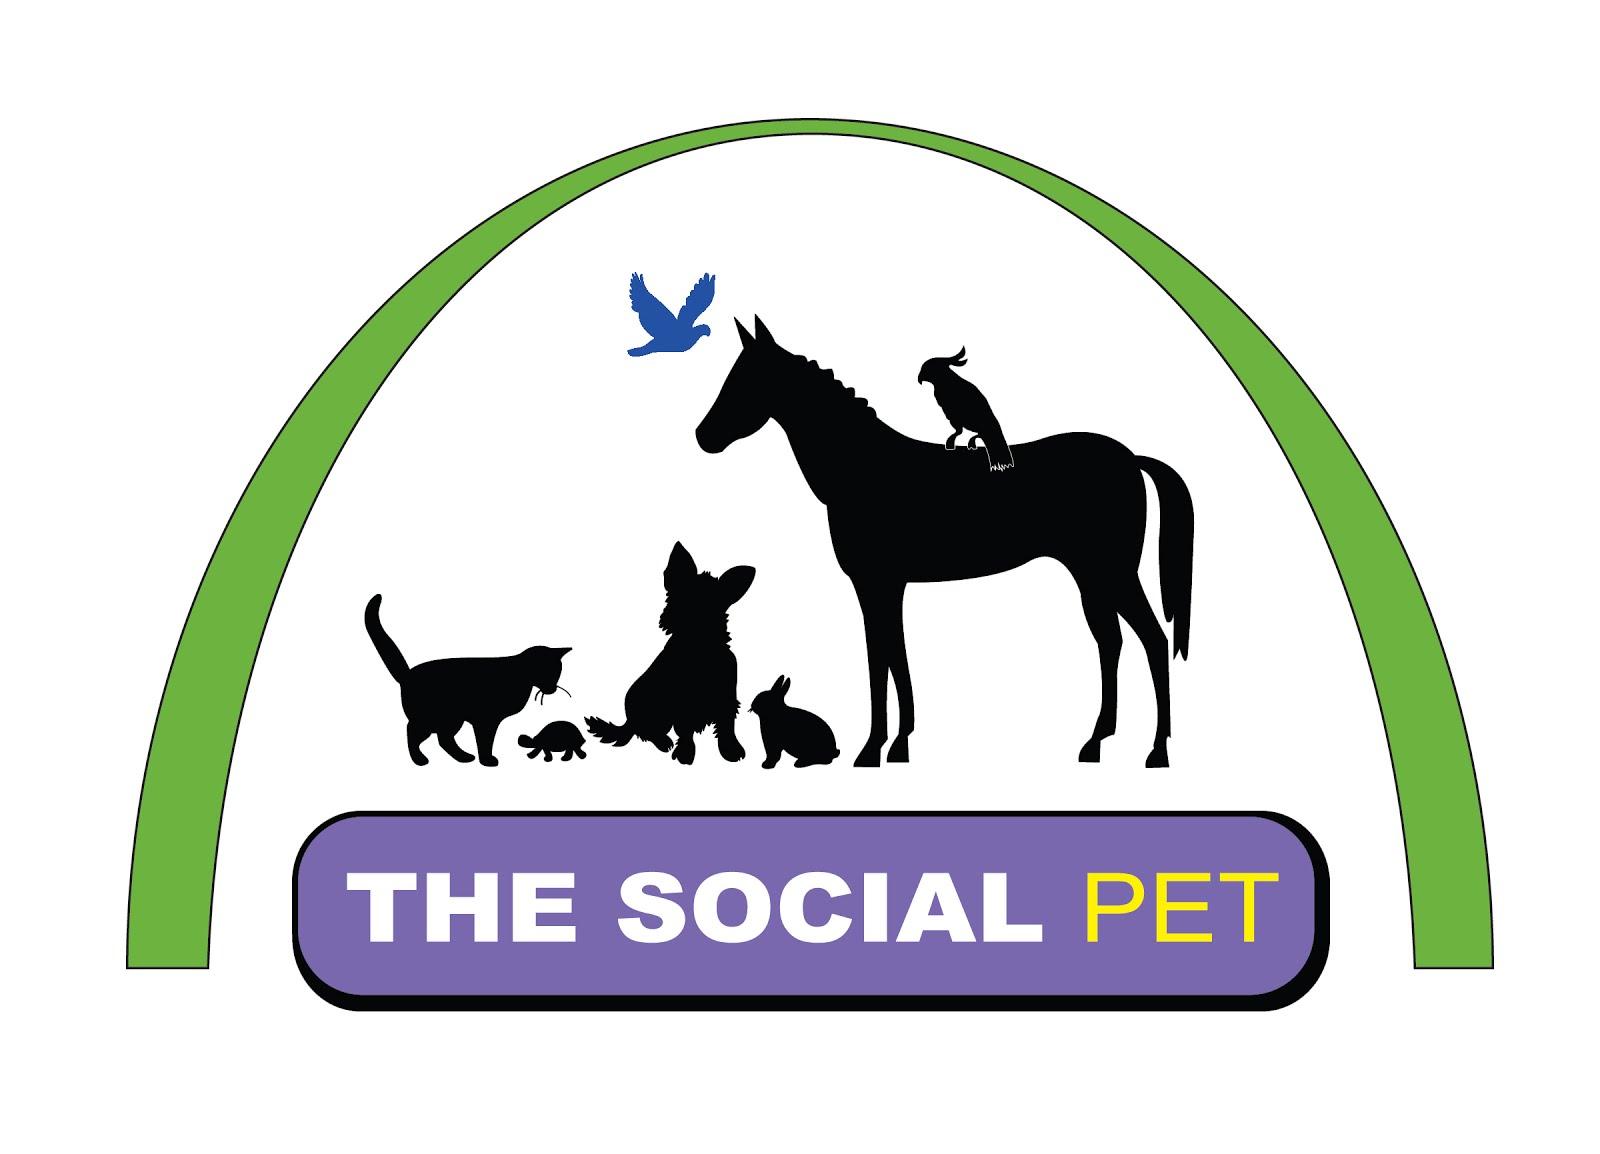 The Social Pet